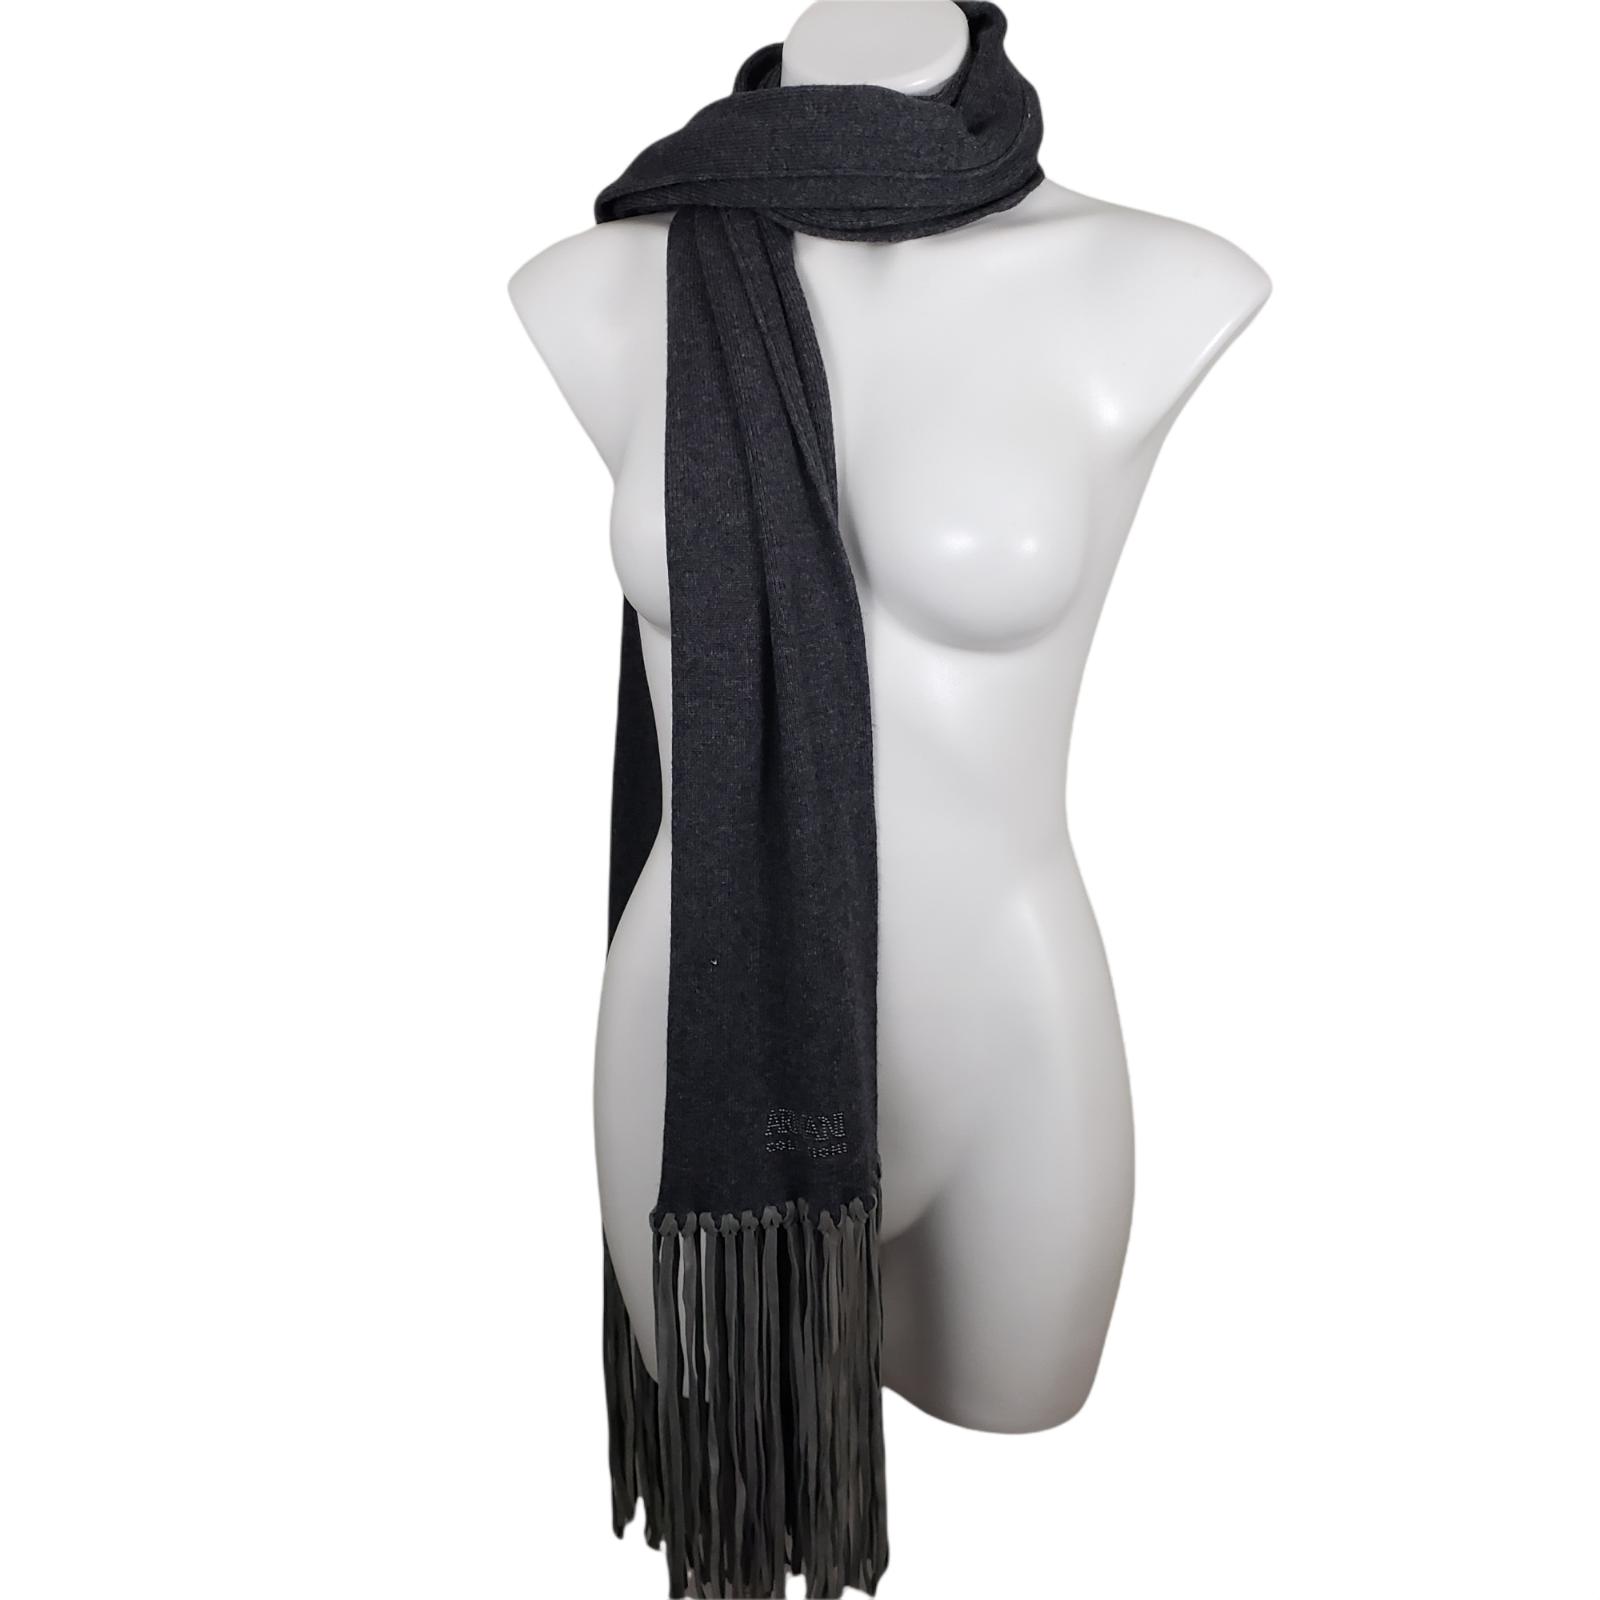 armani collezioni Womens Long Scarf Long Fringe gray rhinestone winter warm